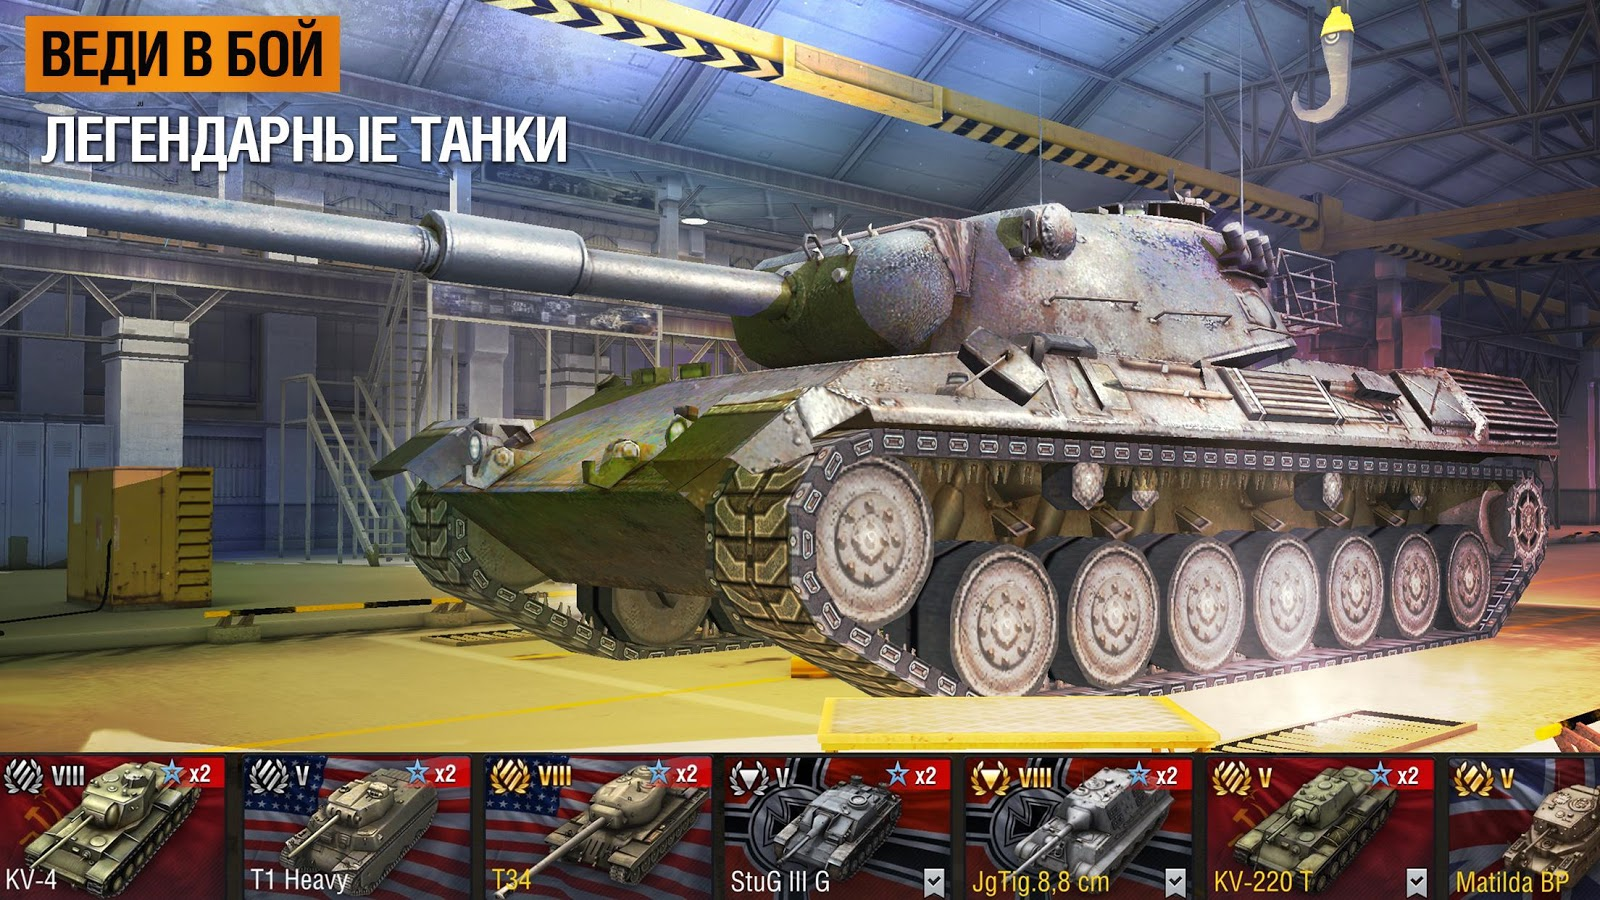 Ворлд оф танк скачать моды про танки.